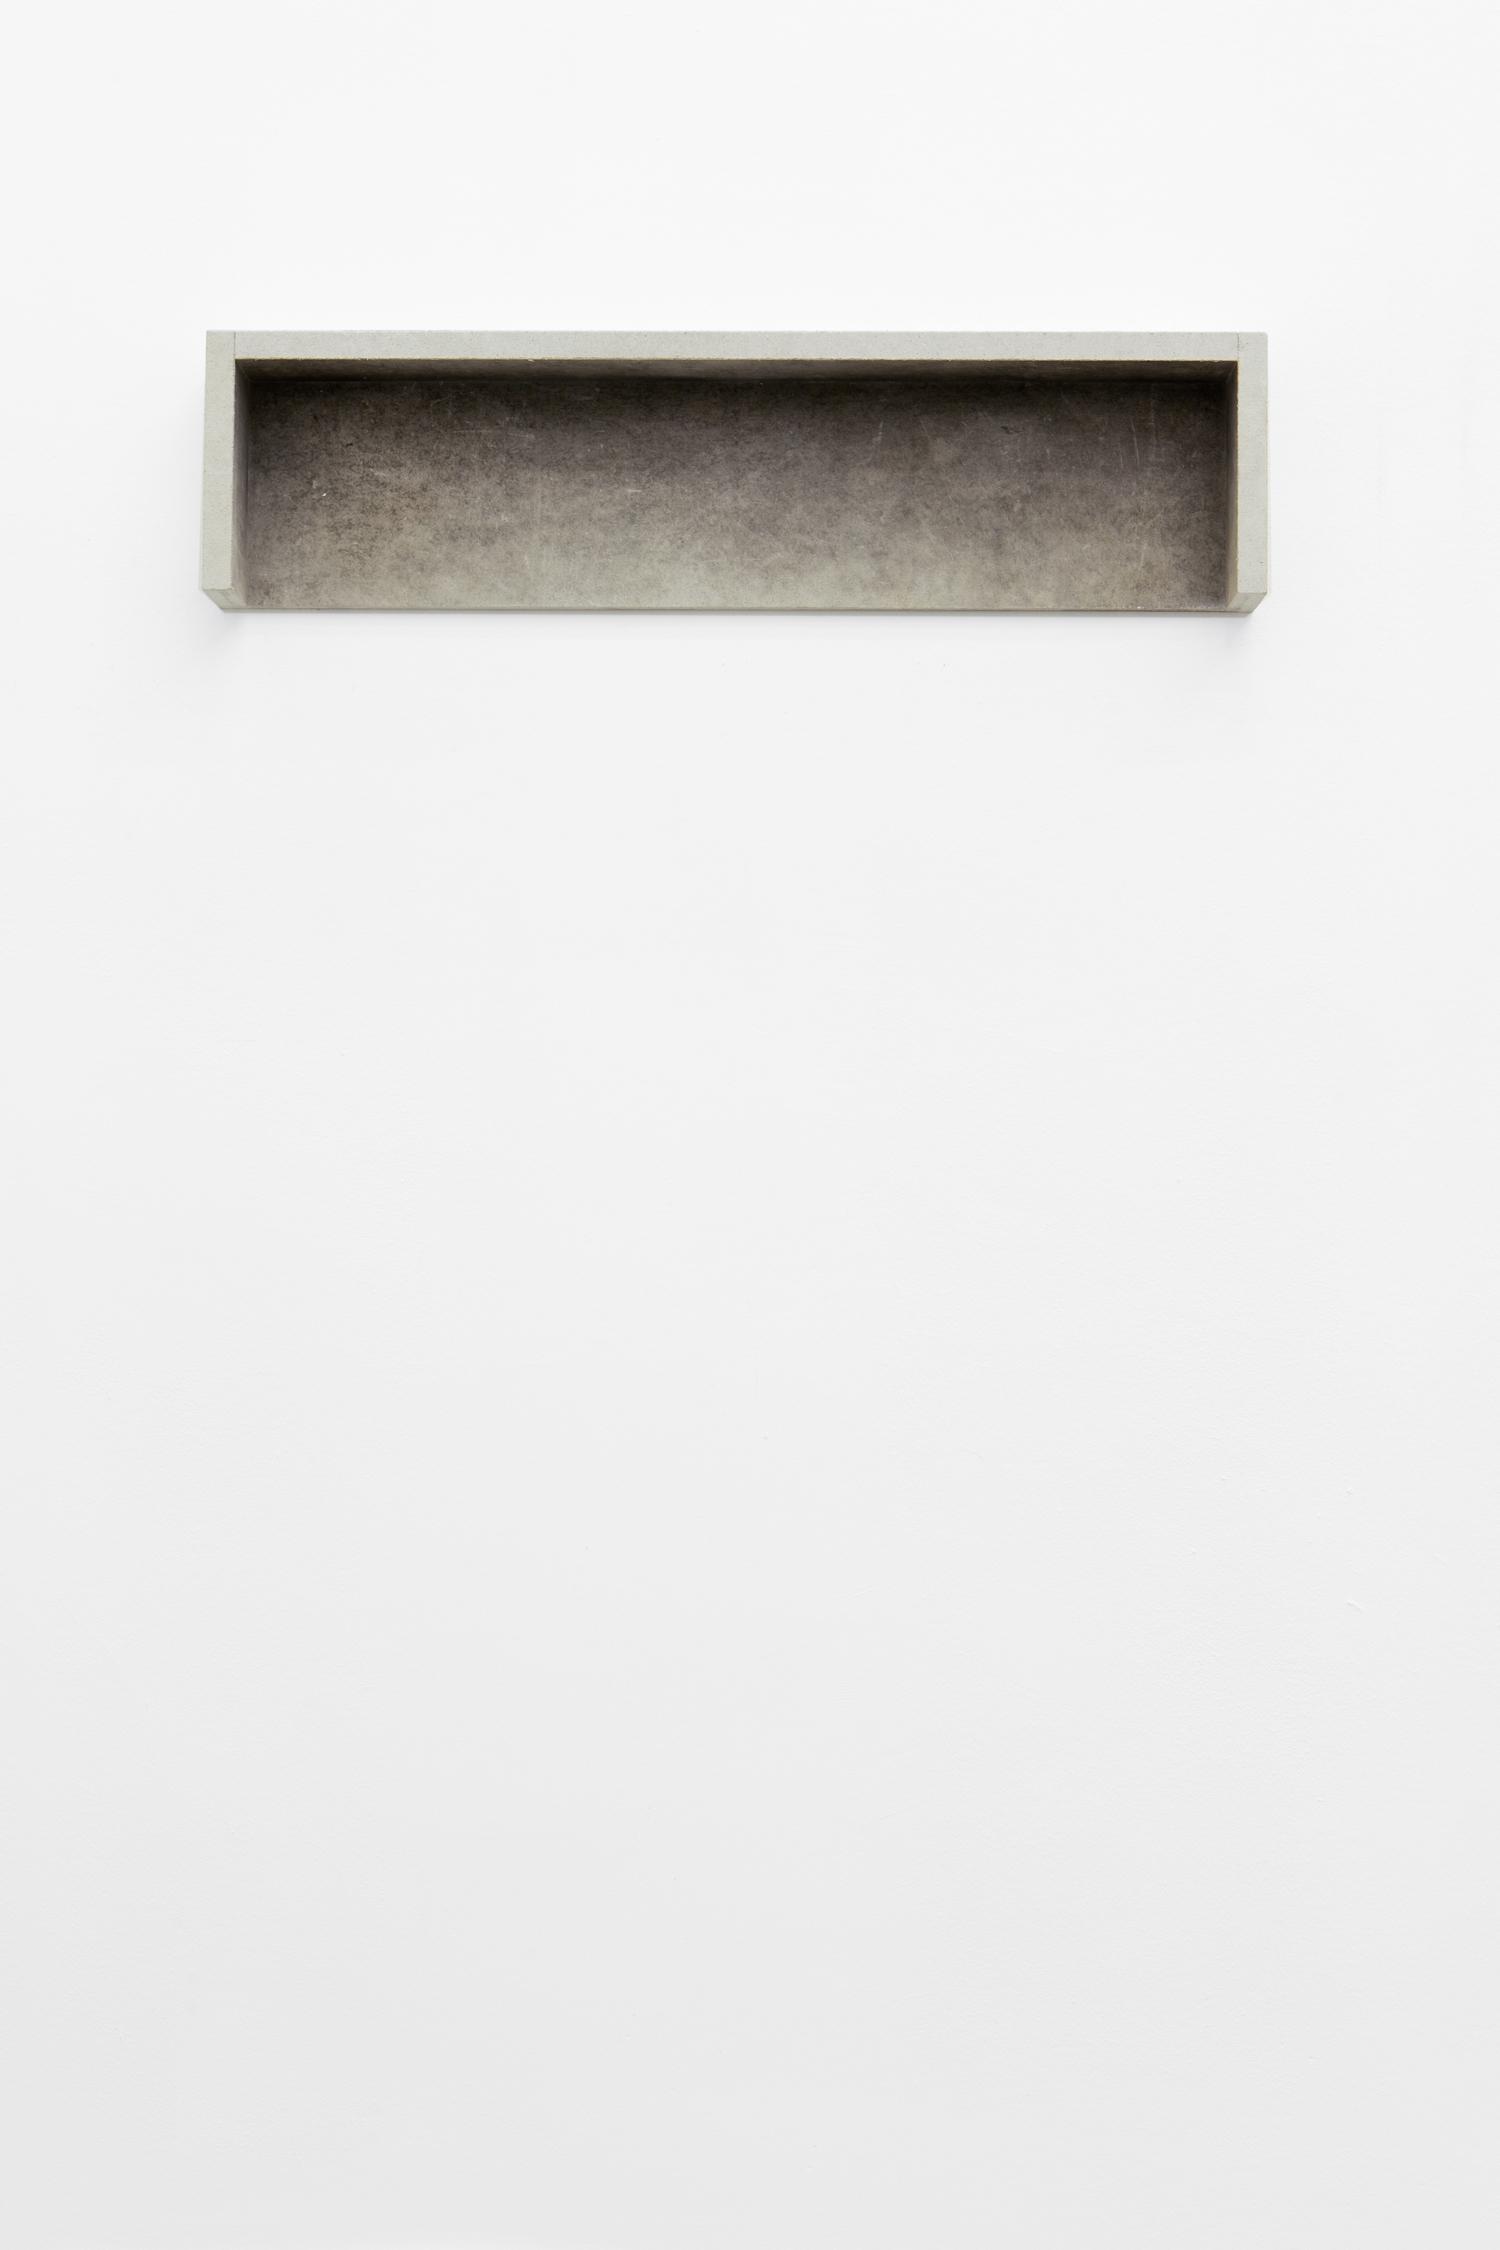 14 - Galerie Meyer Kainercurated byFlorian Pumhösl